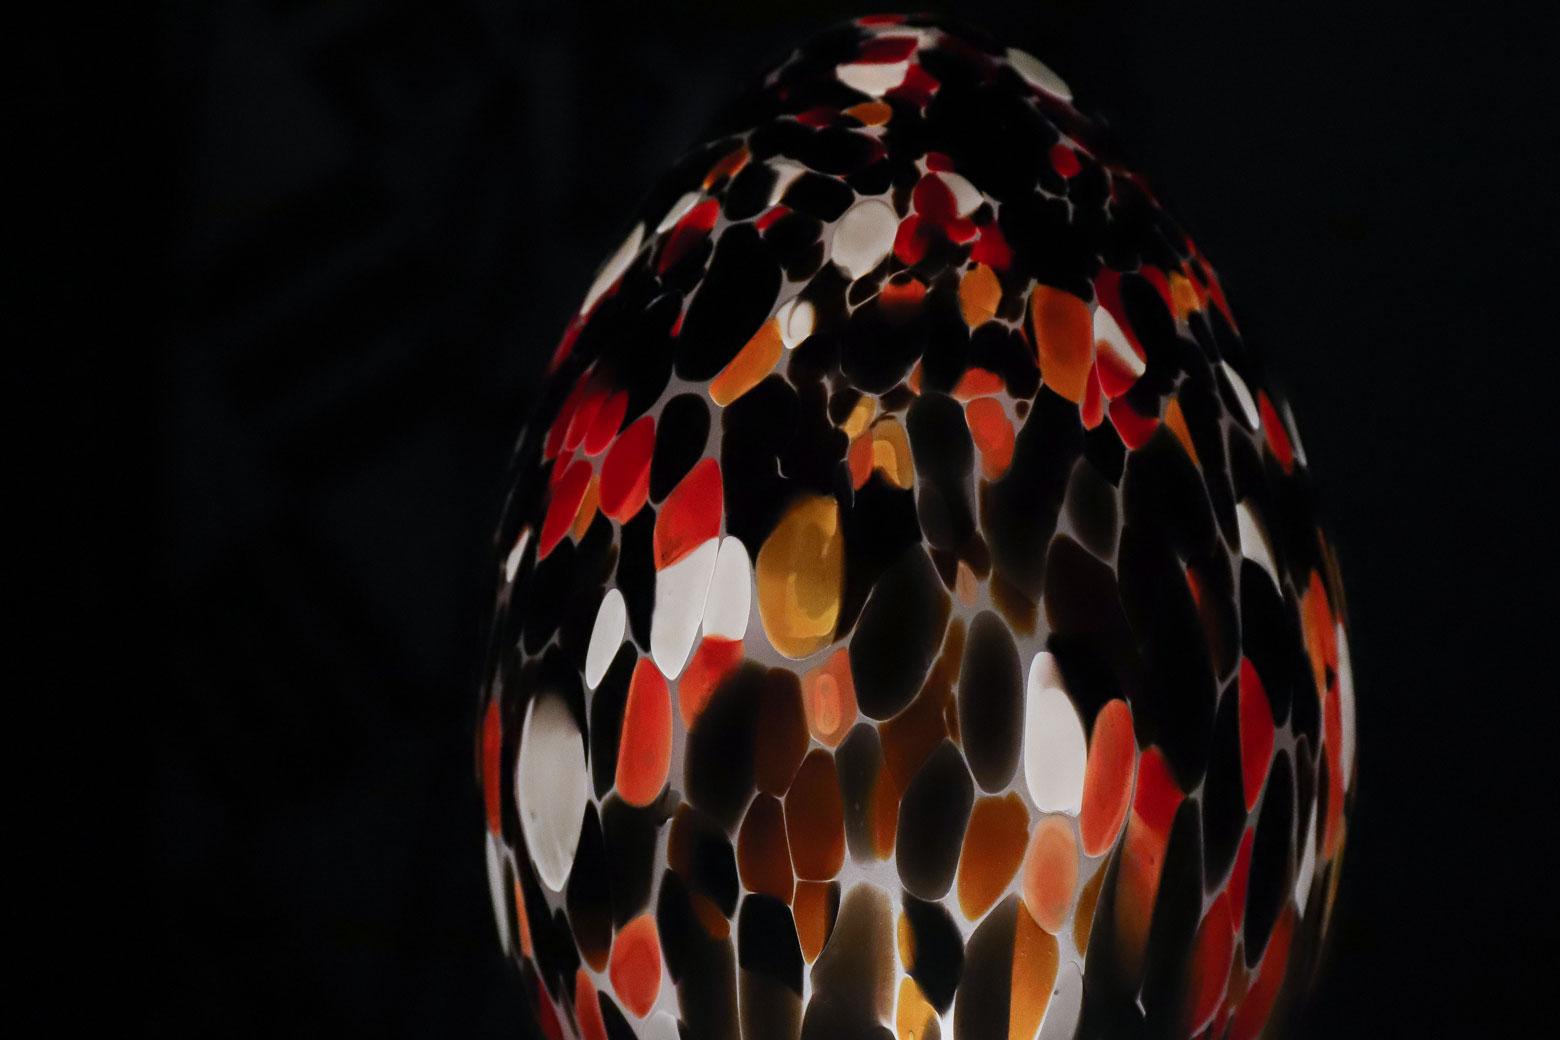 Boda Glass Egg Monica Backstraom/ボダ ガラス タマゴ モニカ・バックストローム スウェーデン インテリア ヴィンテージ